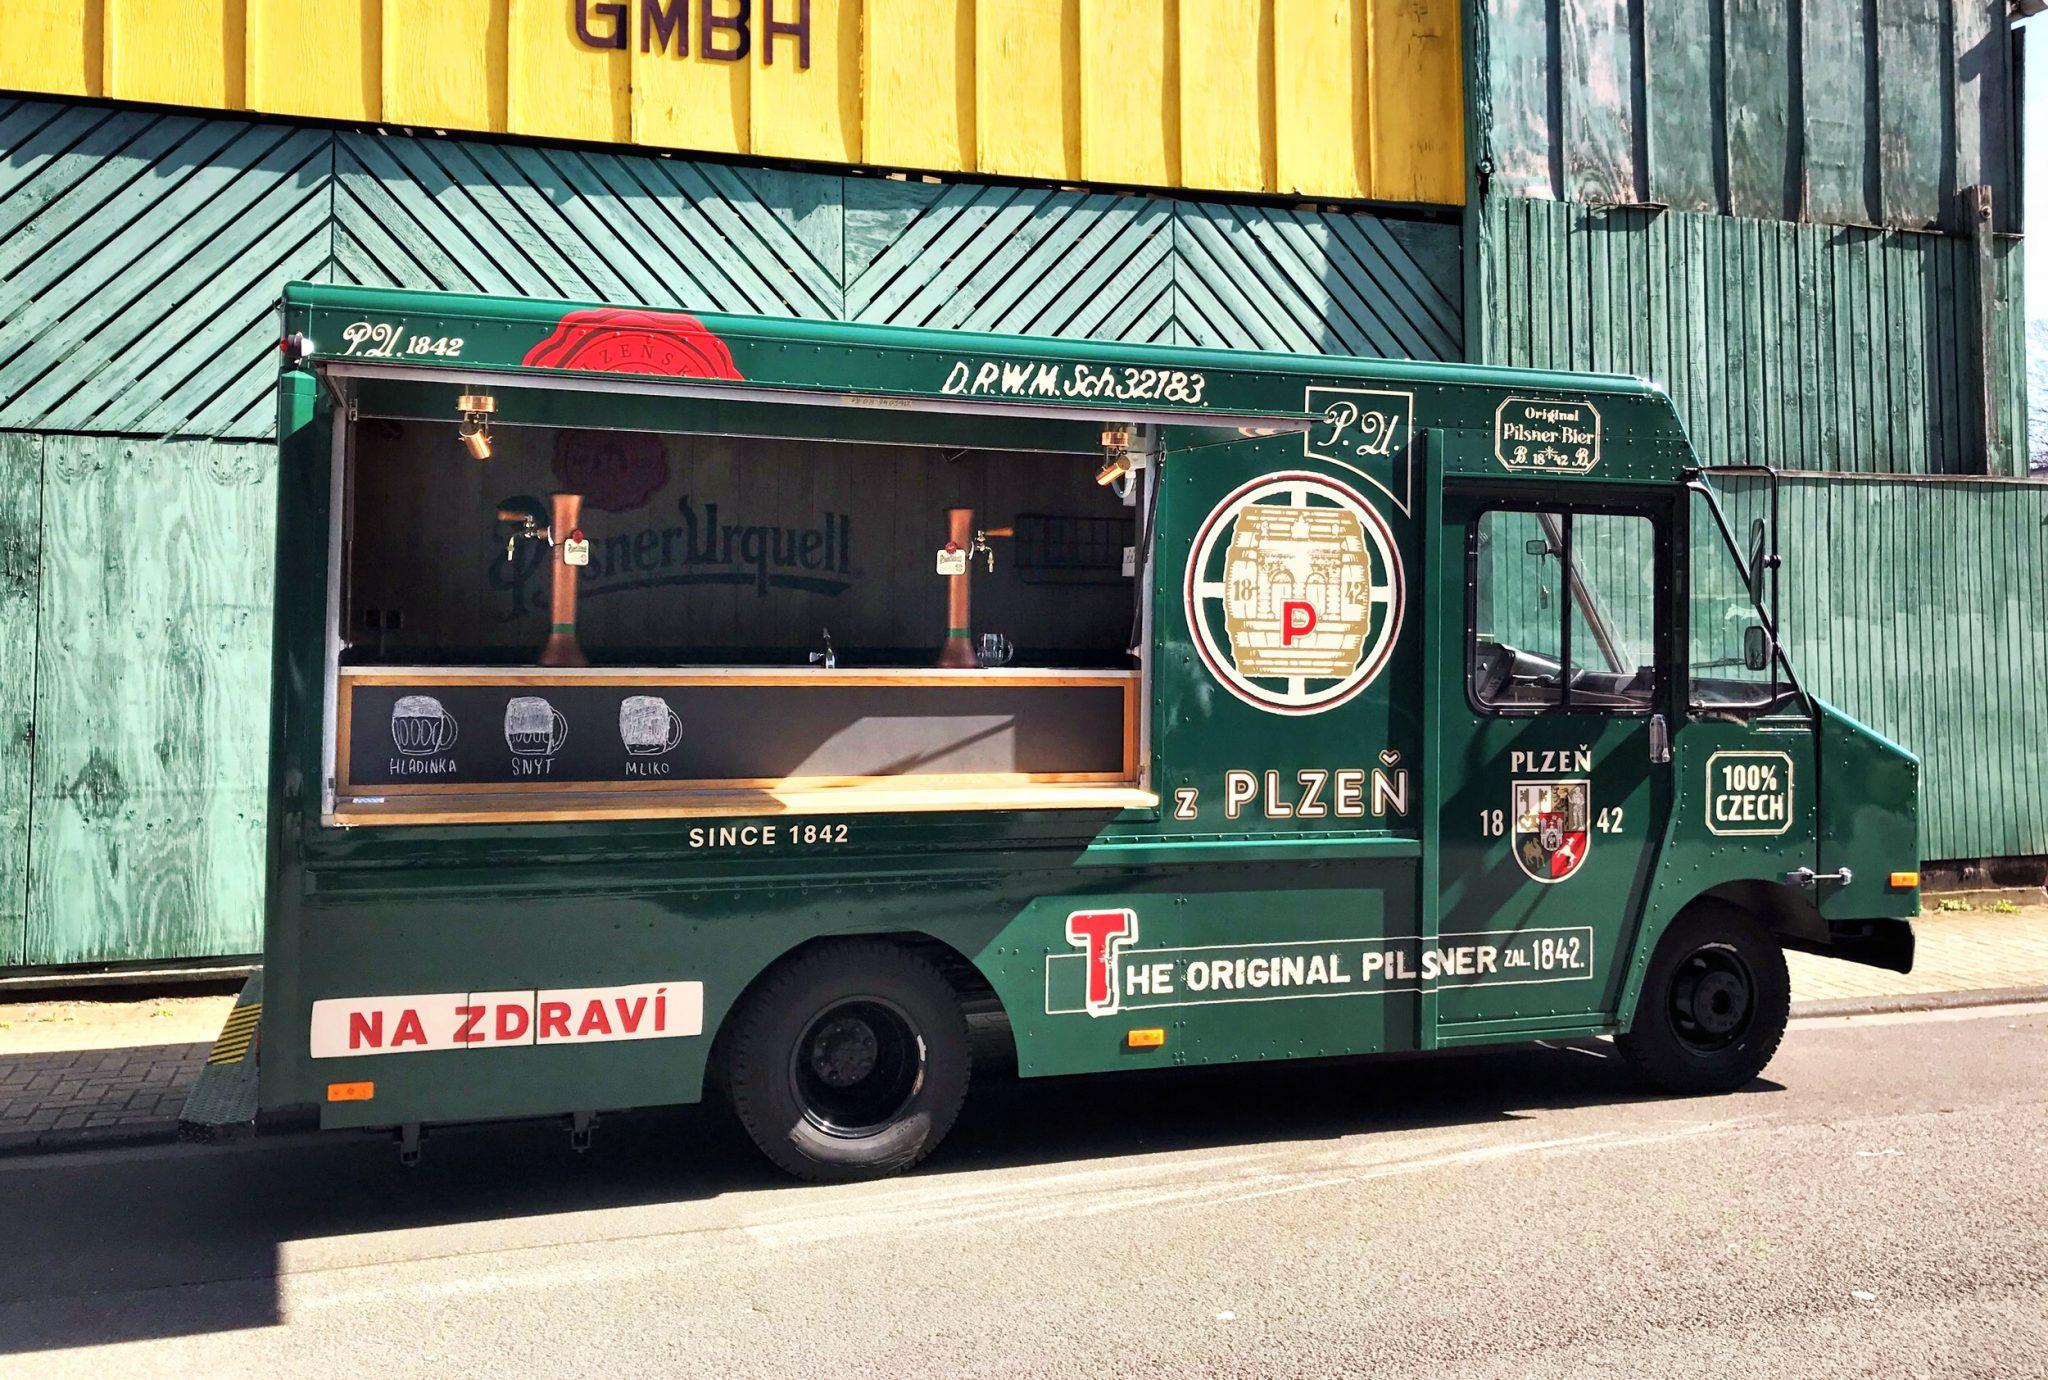 Pilsner Urquell Truck 2018, Design Stil Manipulation 2018,Food Truck,Bar Truck,Truck Design